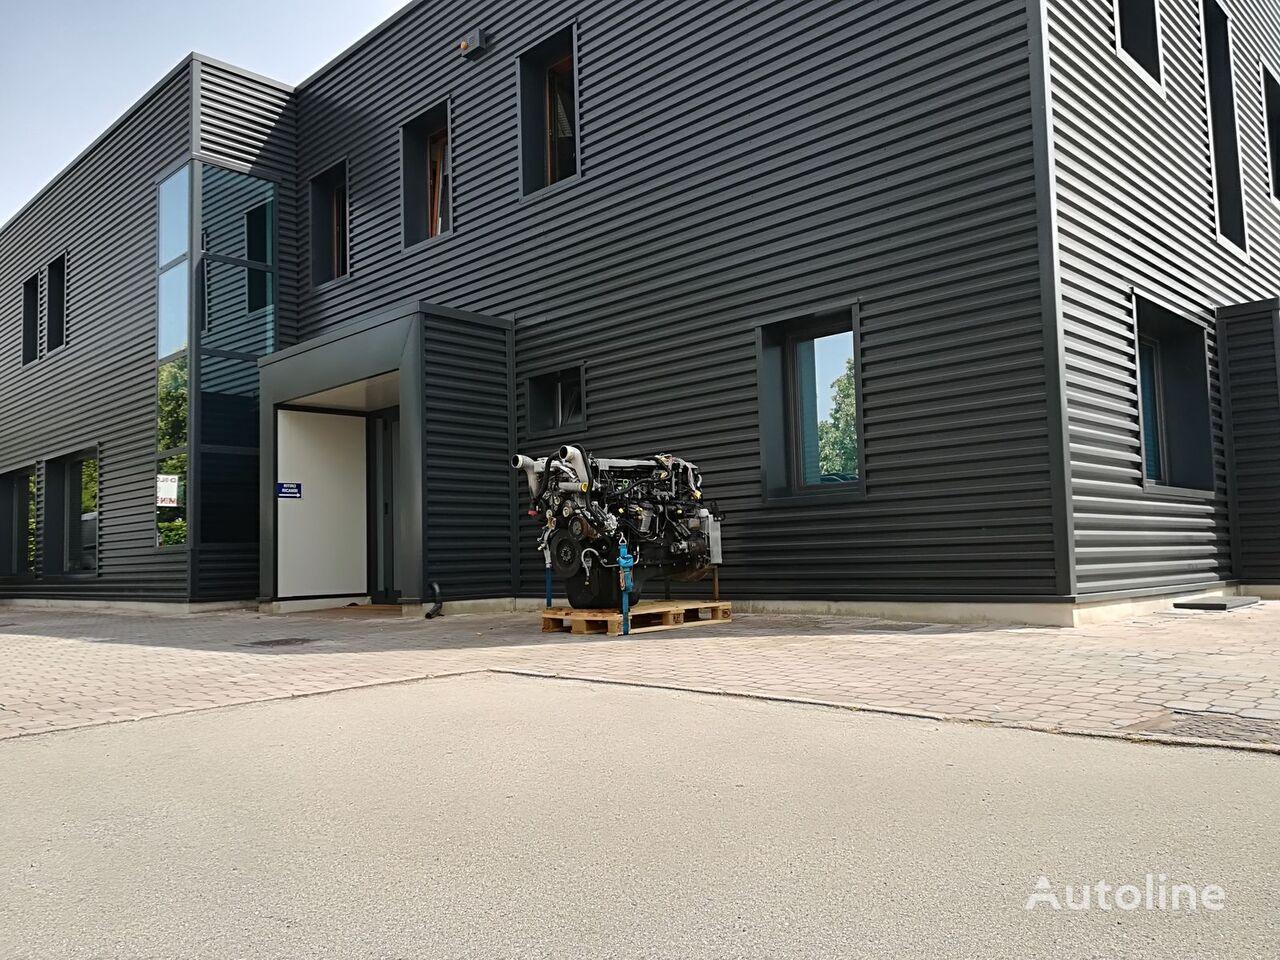 MAN MOTOR D2066 LF32 Euro 4 TGA 400 HP (D2066 LF32) engine for MAN TGA 400HP Euro 4 truck